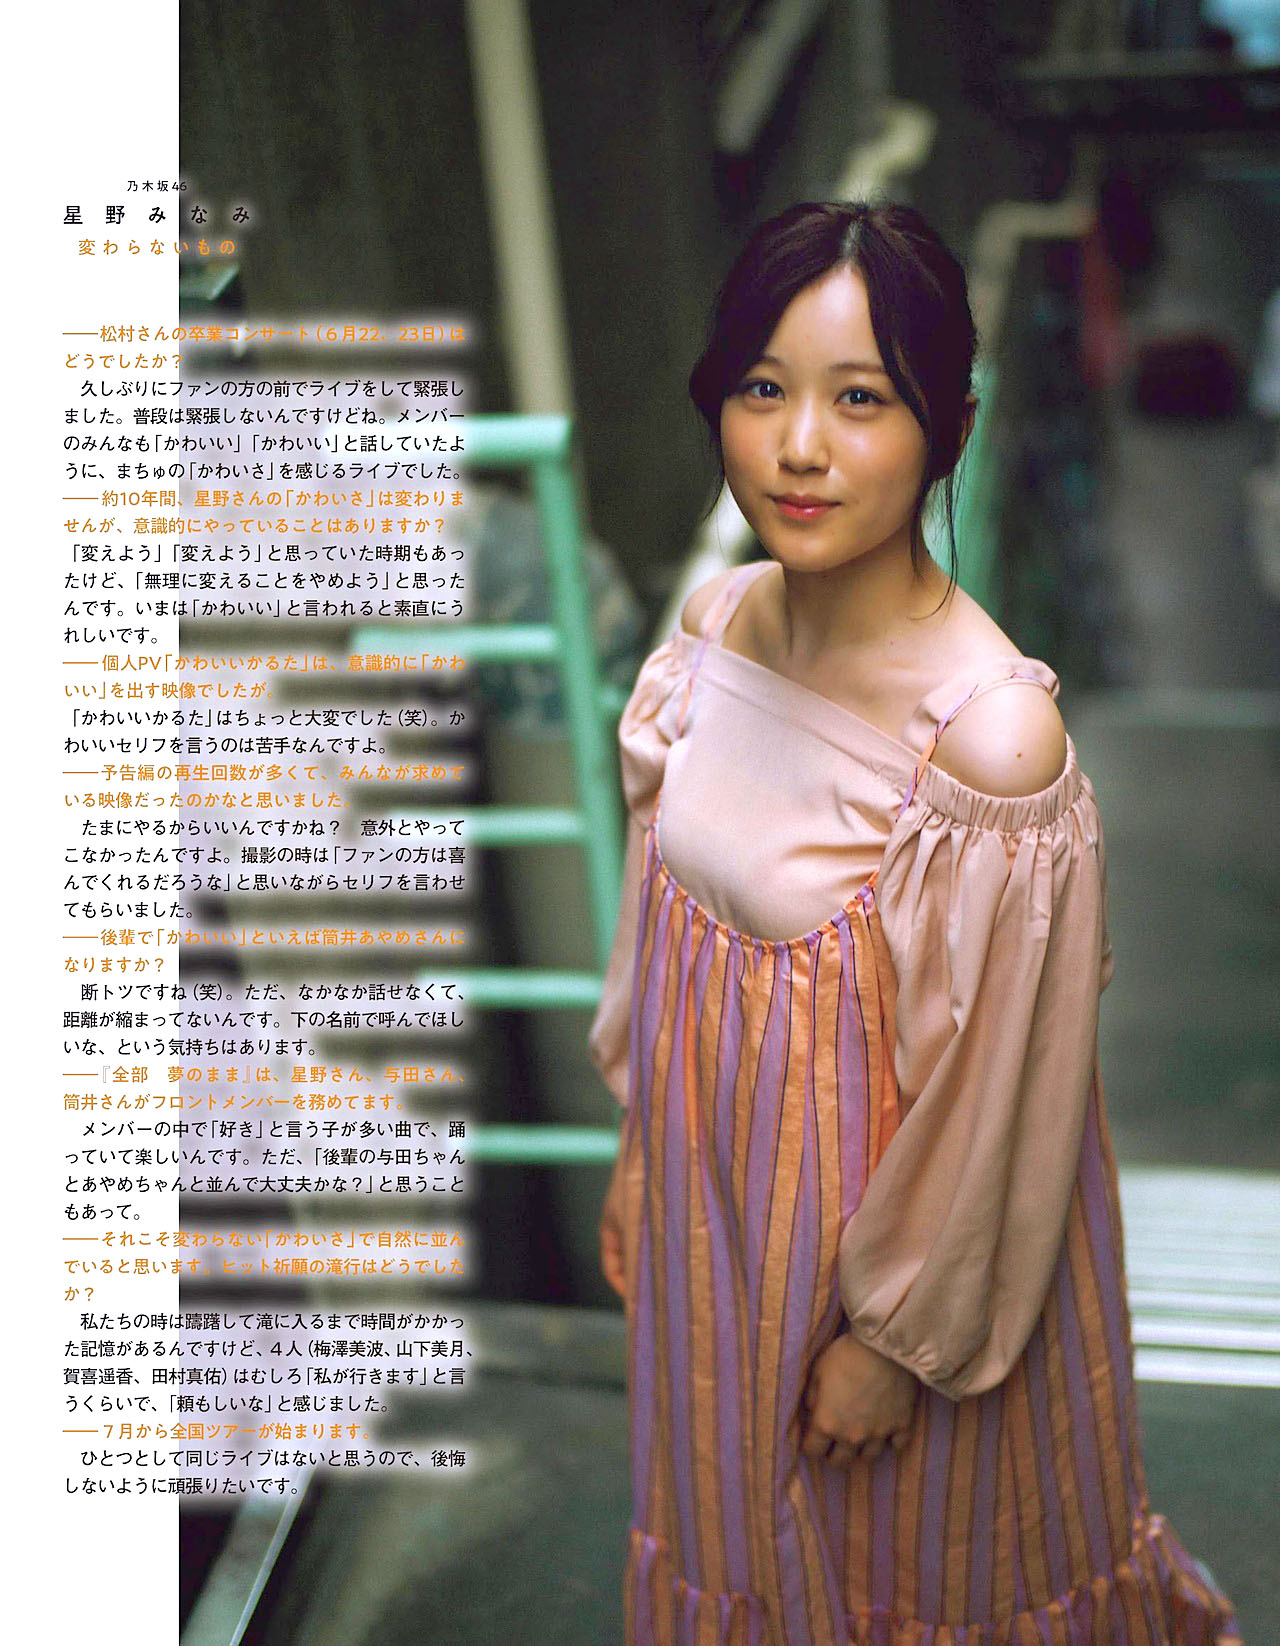 MHoshino EX-Taishu 2108 04.jpg